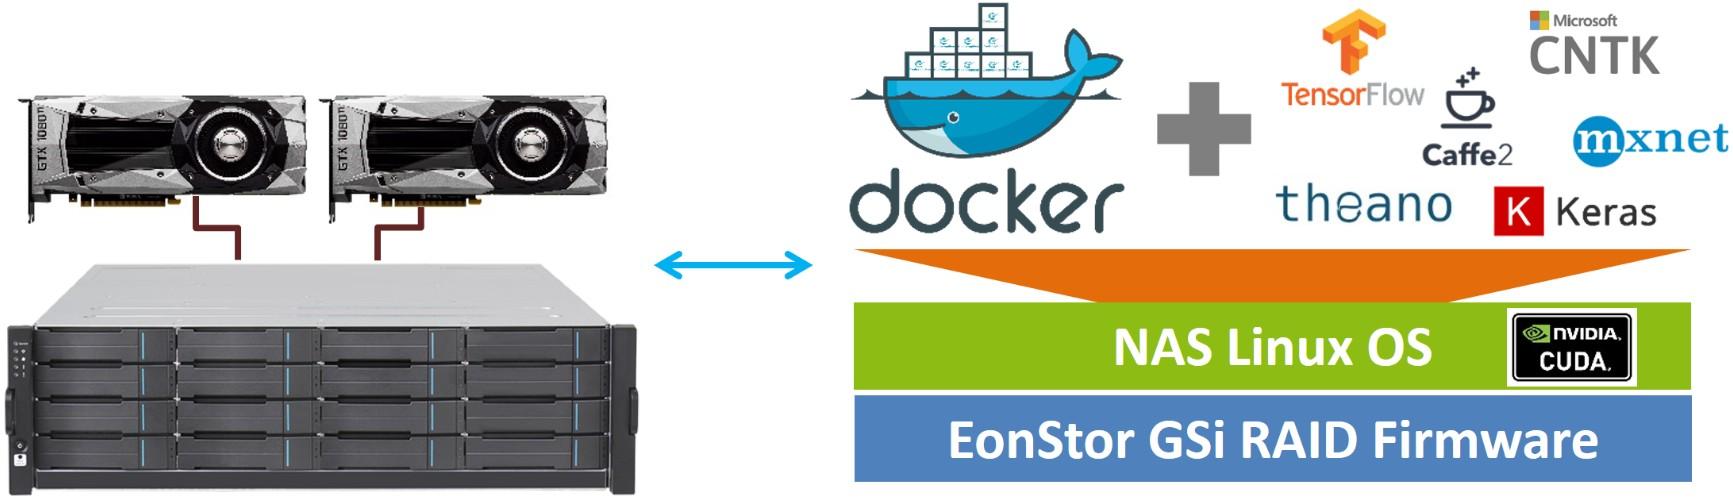 Infortrend存储 EonStor GSi 深度学习AI存储一体机